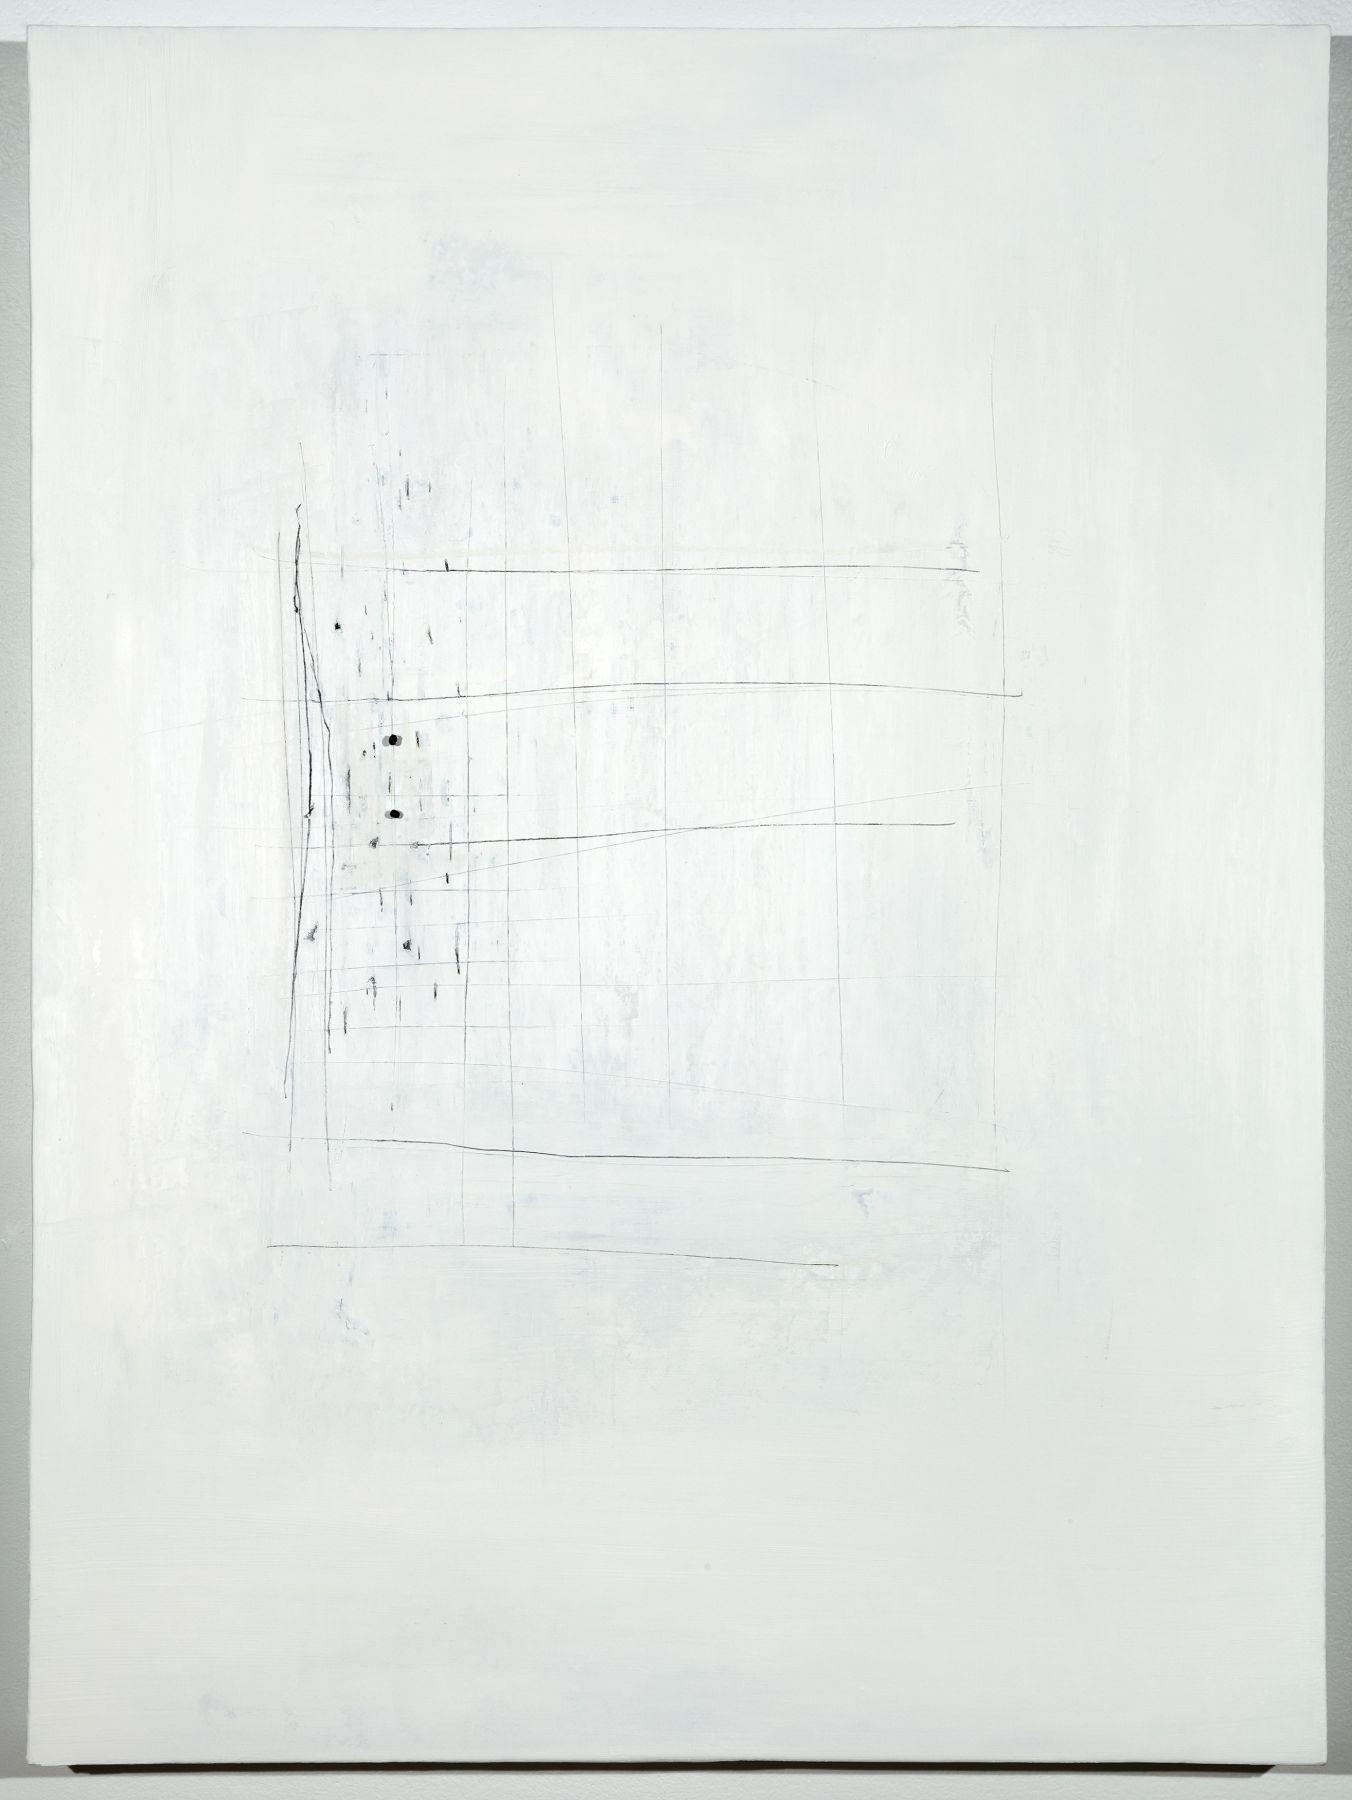 SIDONIE VILLERE Untitled, 2013